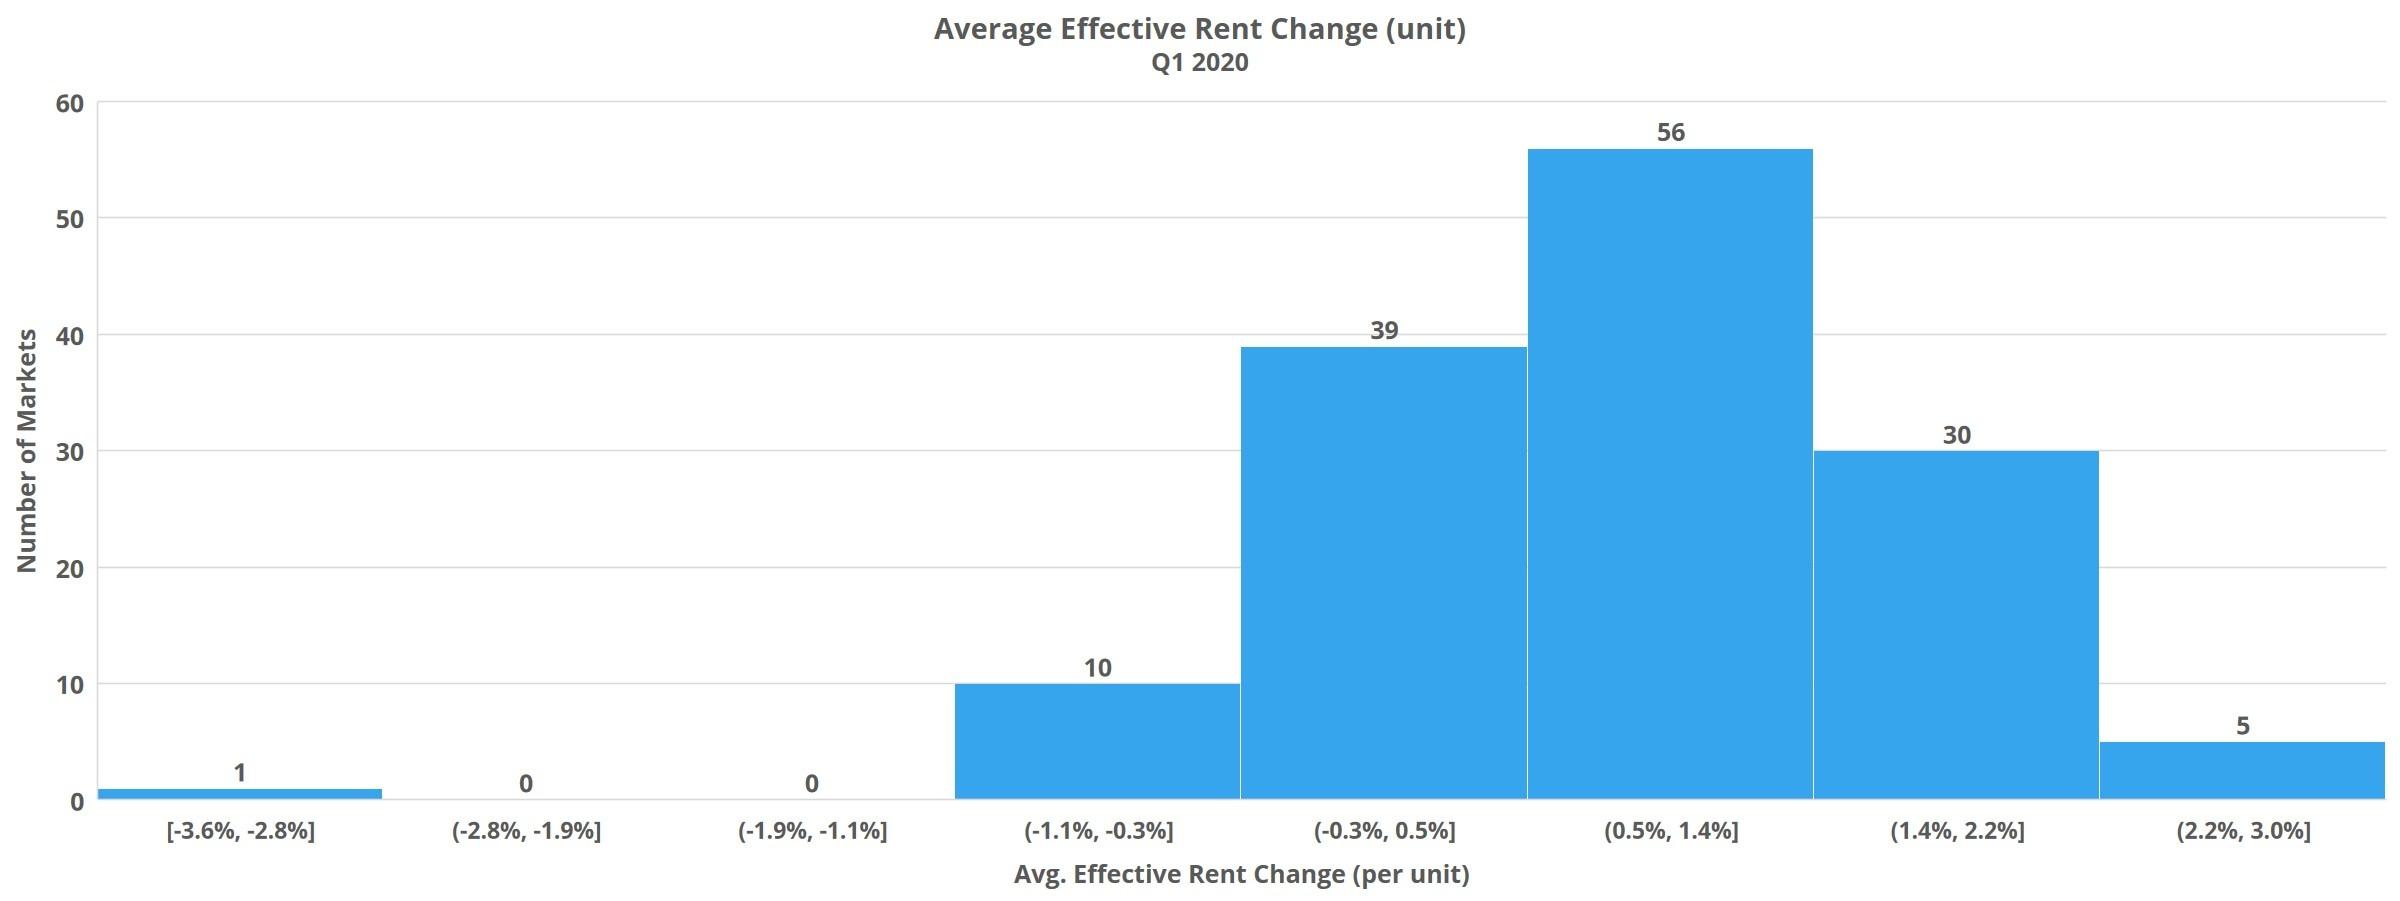 Average Effective Rent Change Q1 2020